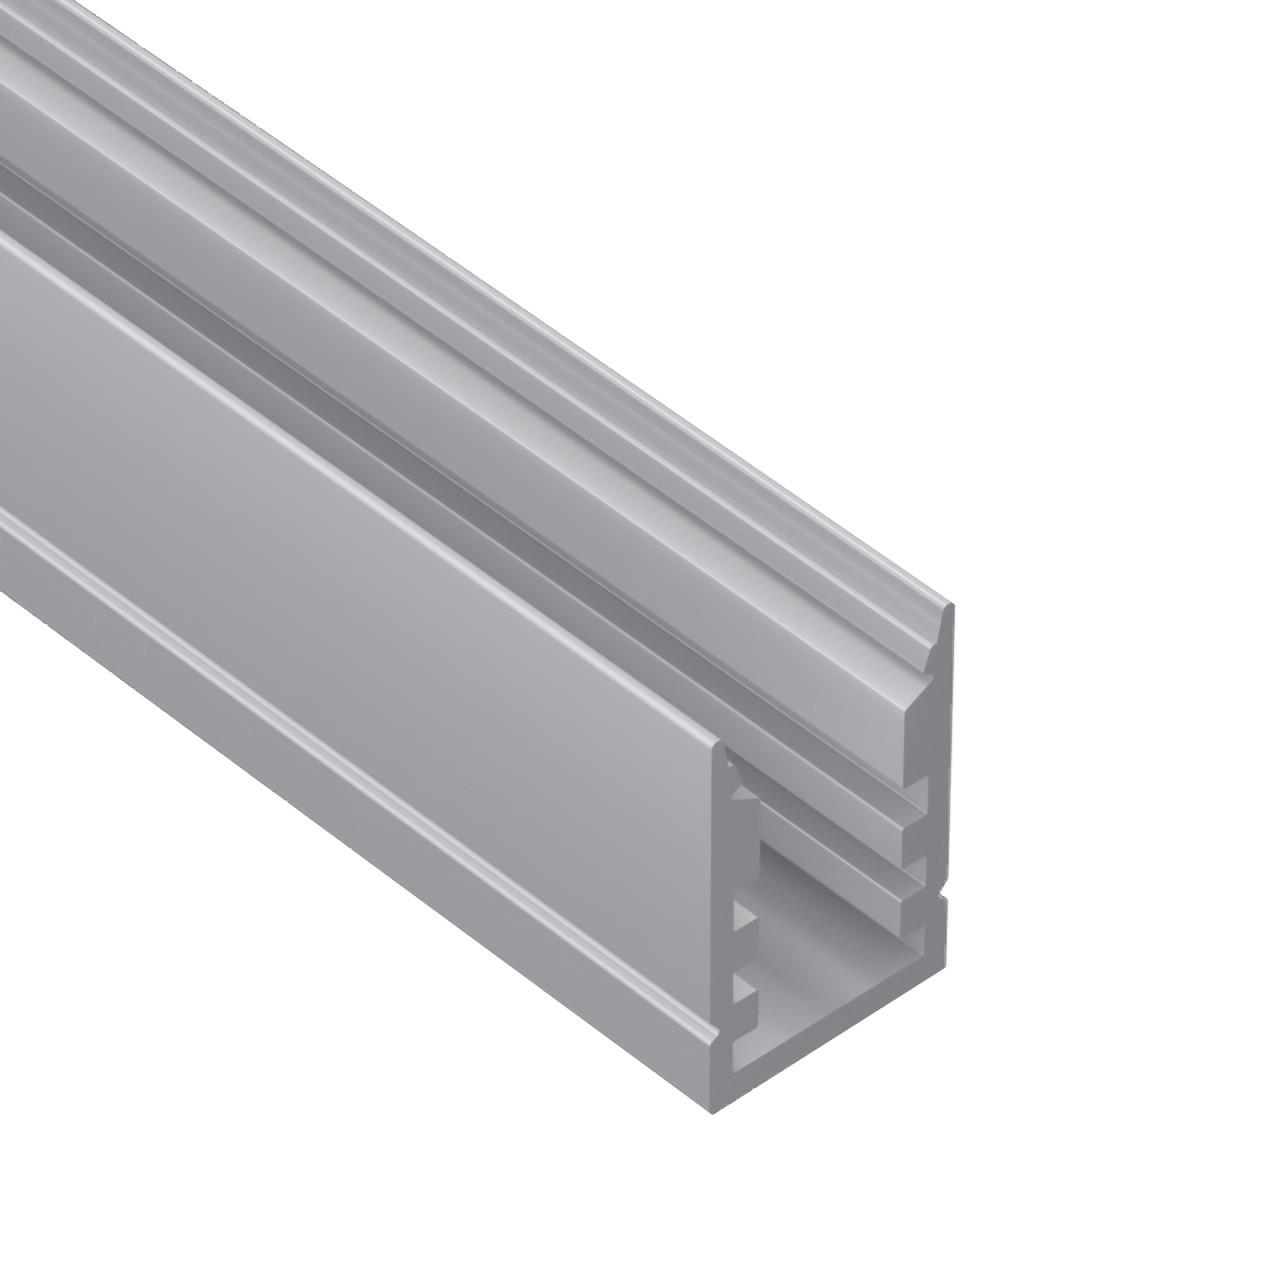 AS7 Surface Mount Led Aluminum Profile